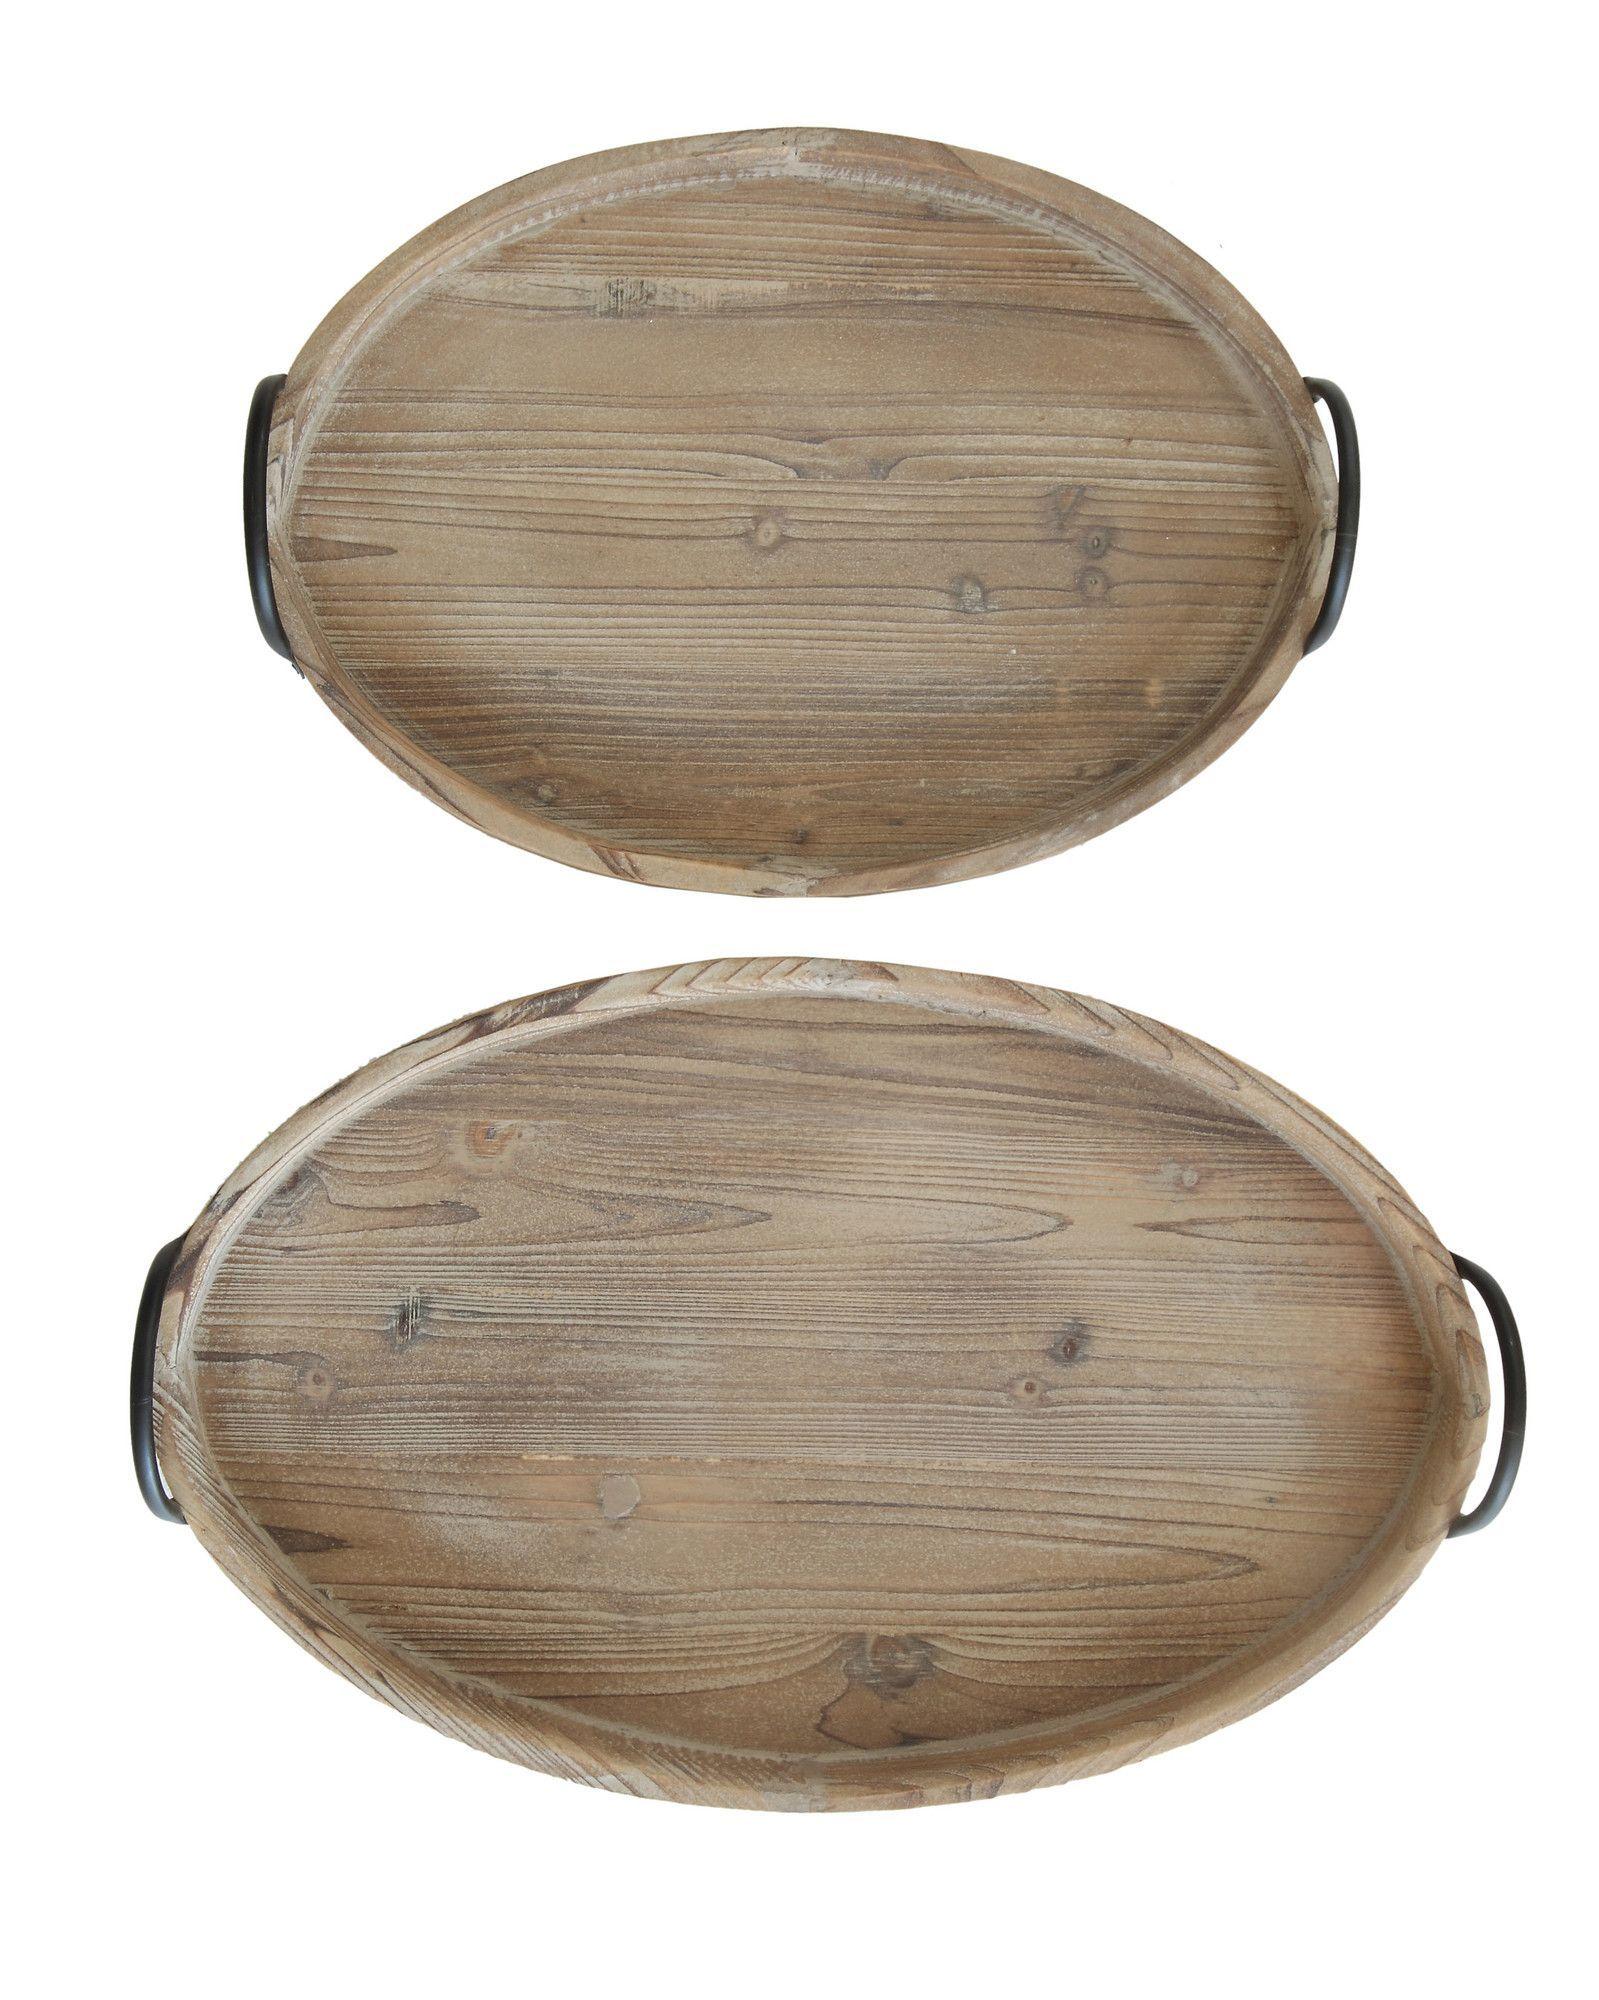 Honey 2 Piece Decorative Wood Tray with Metal Handle Set